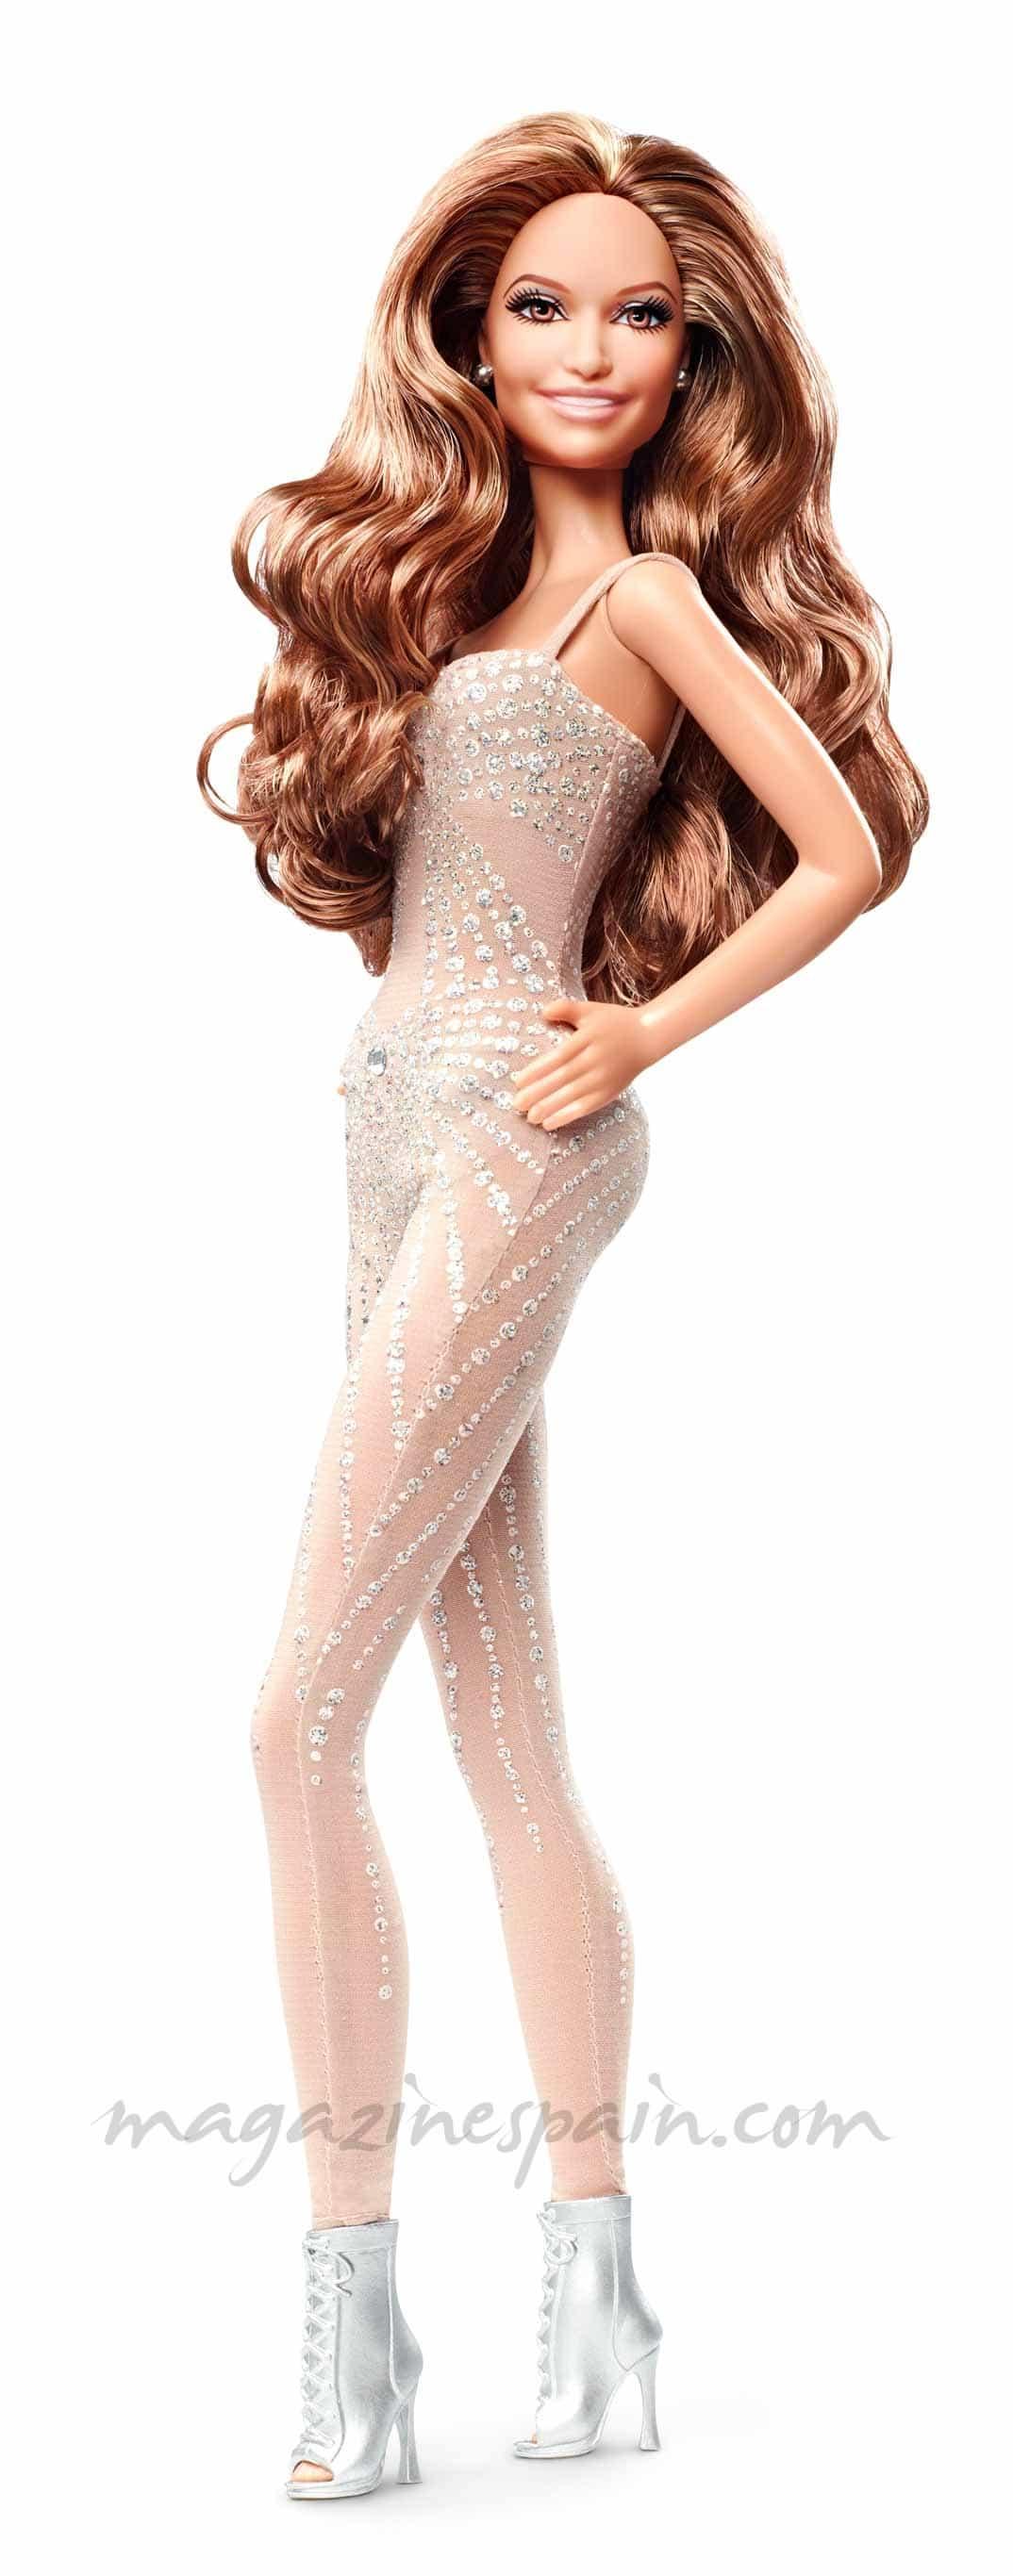 jennifer-lopez-Barbie-1